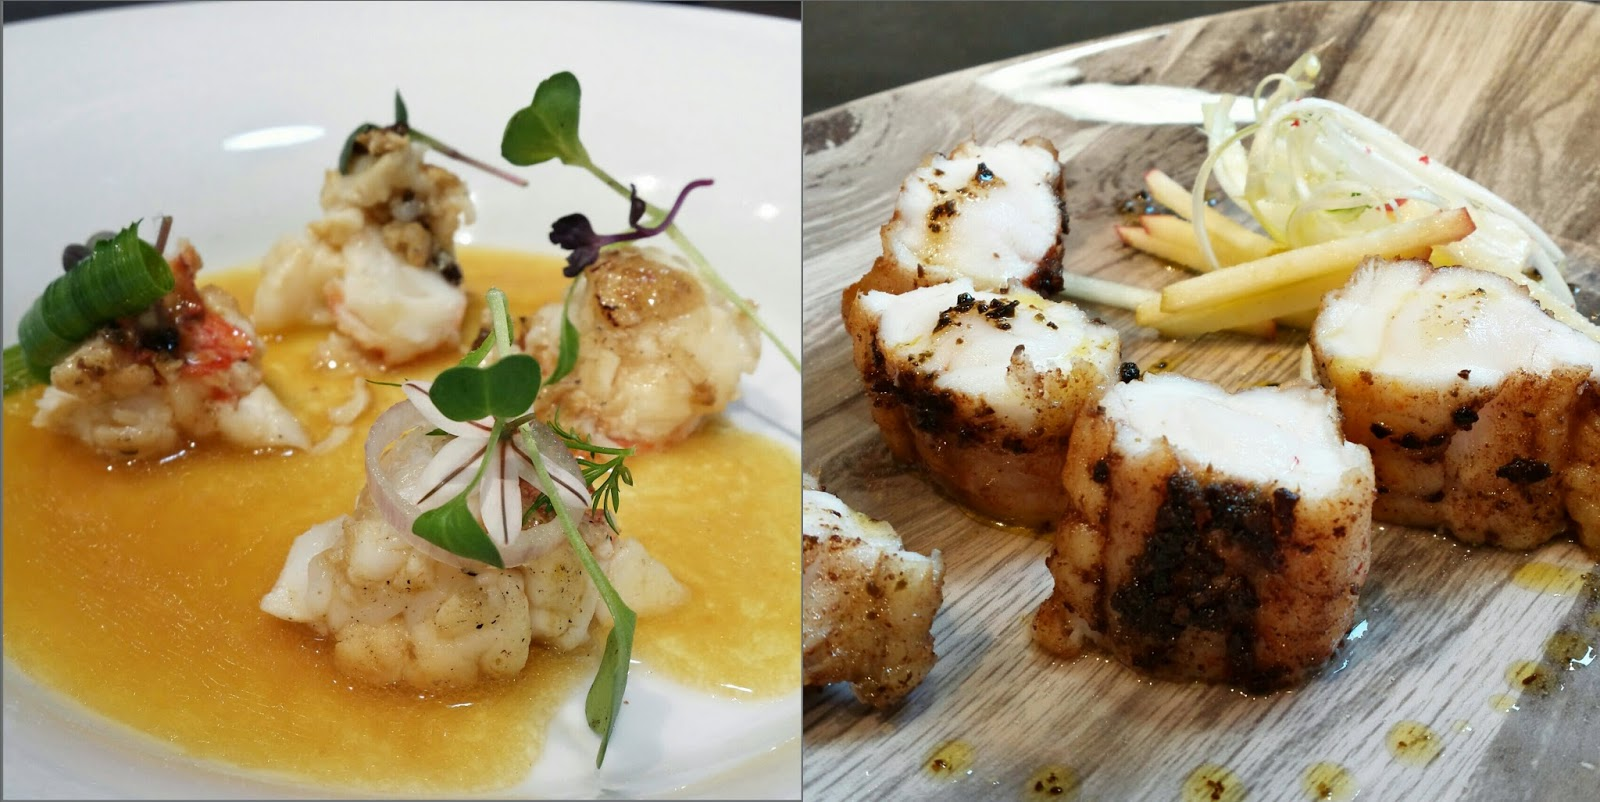 GastroAlicante 2015 - Raul Aleixandre